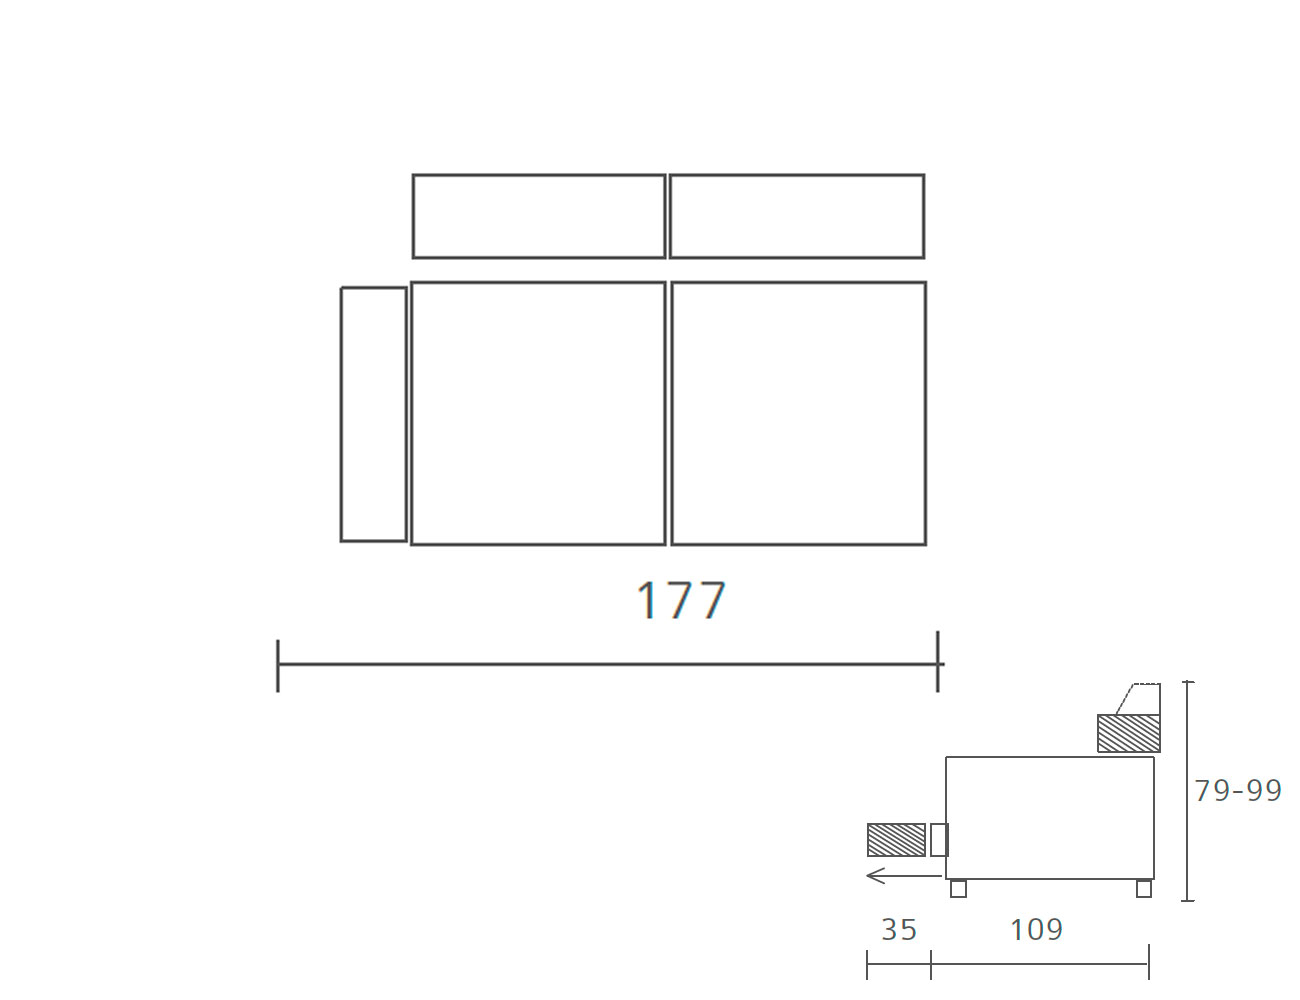 Sofa piel 2 plazas 1771